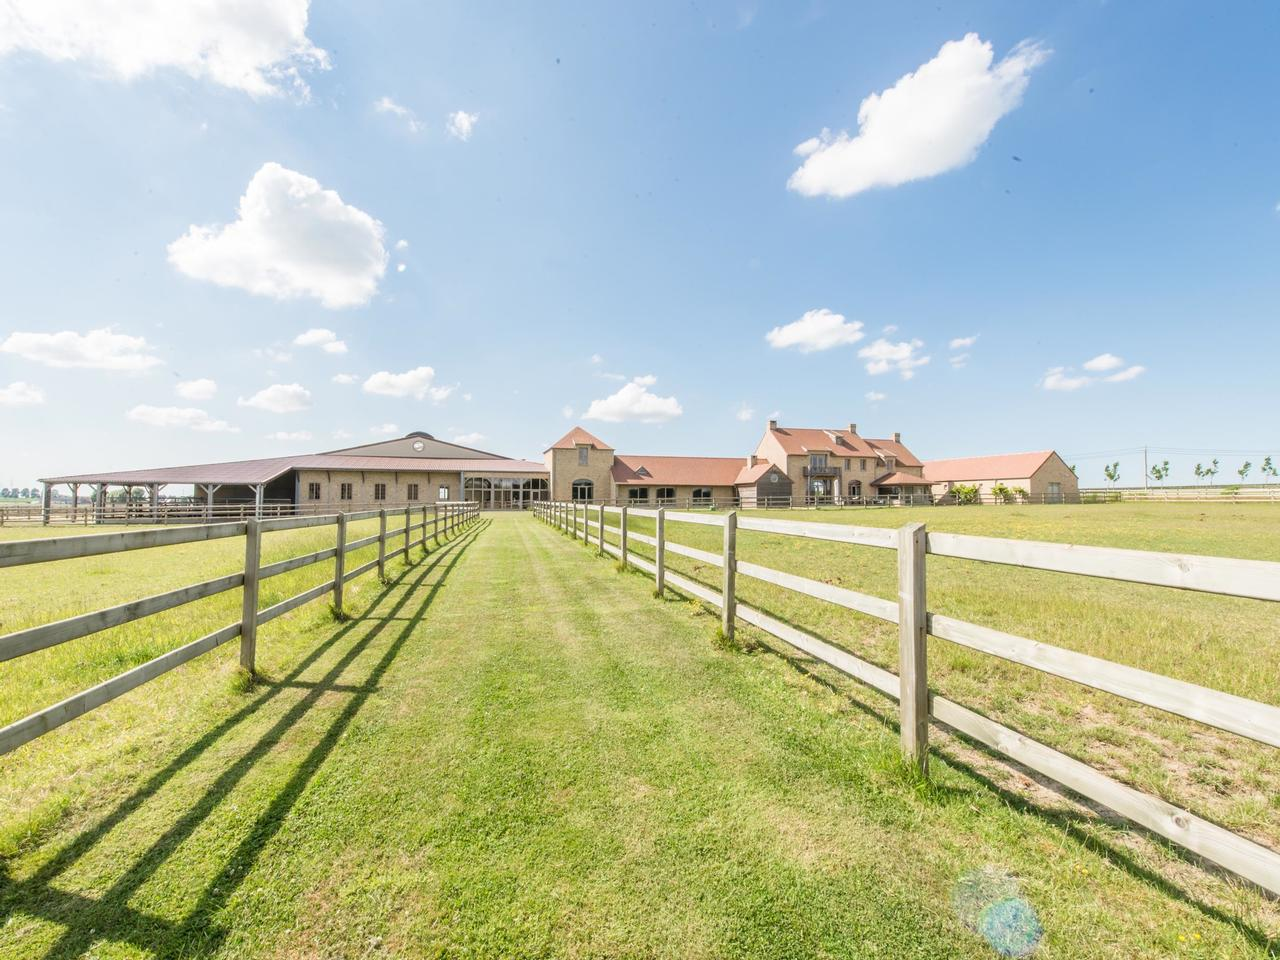 Farm / Ranch / Plantation for Sale at West Vlaanderen I Langemark Other Belgium, Other Areas In Belgium, 8920 Belgium